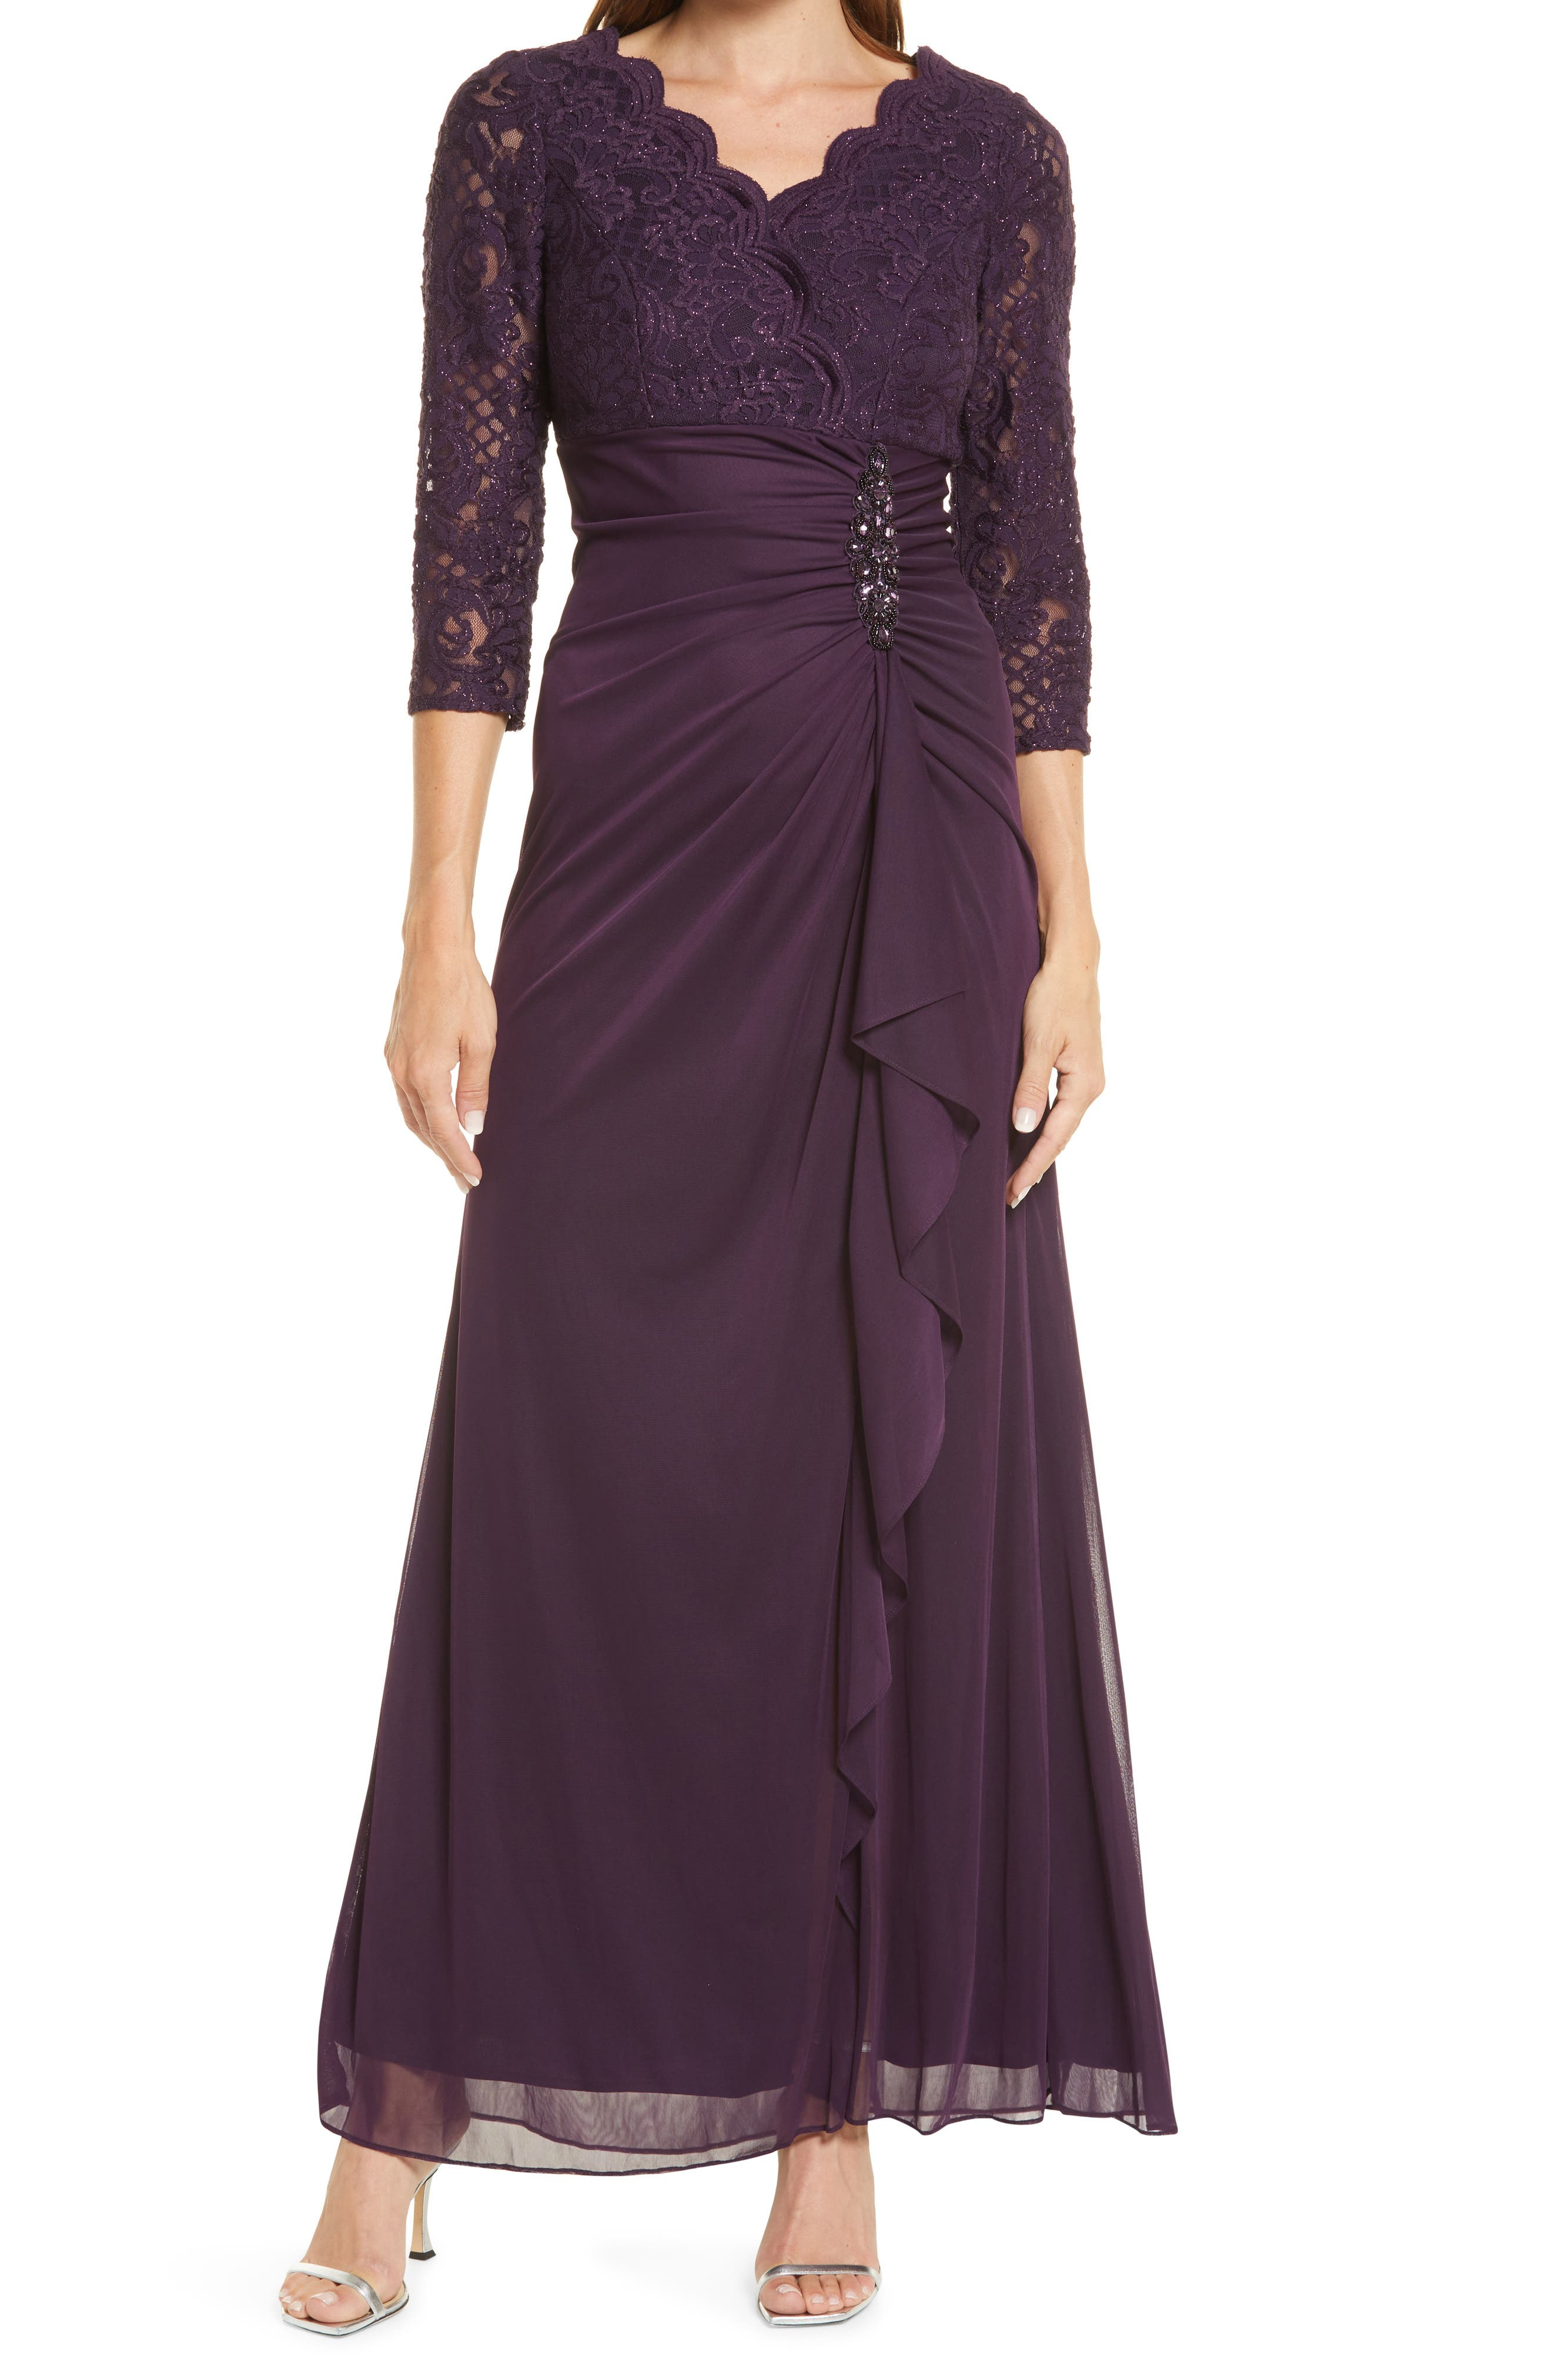 Sequin Lace A-Line Gown